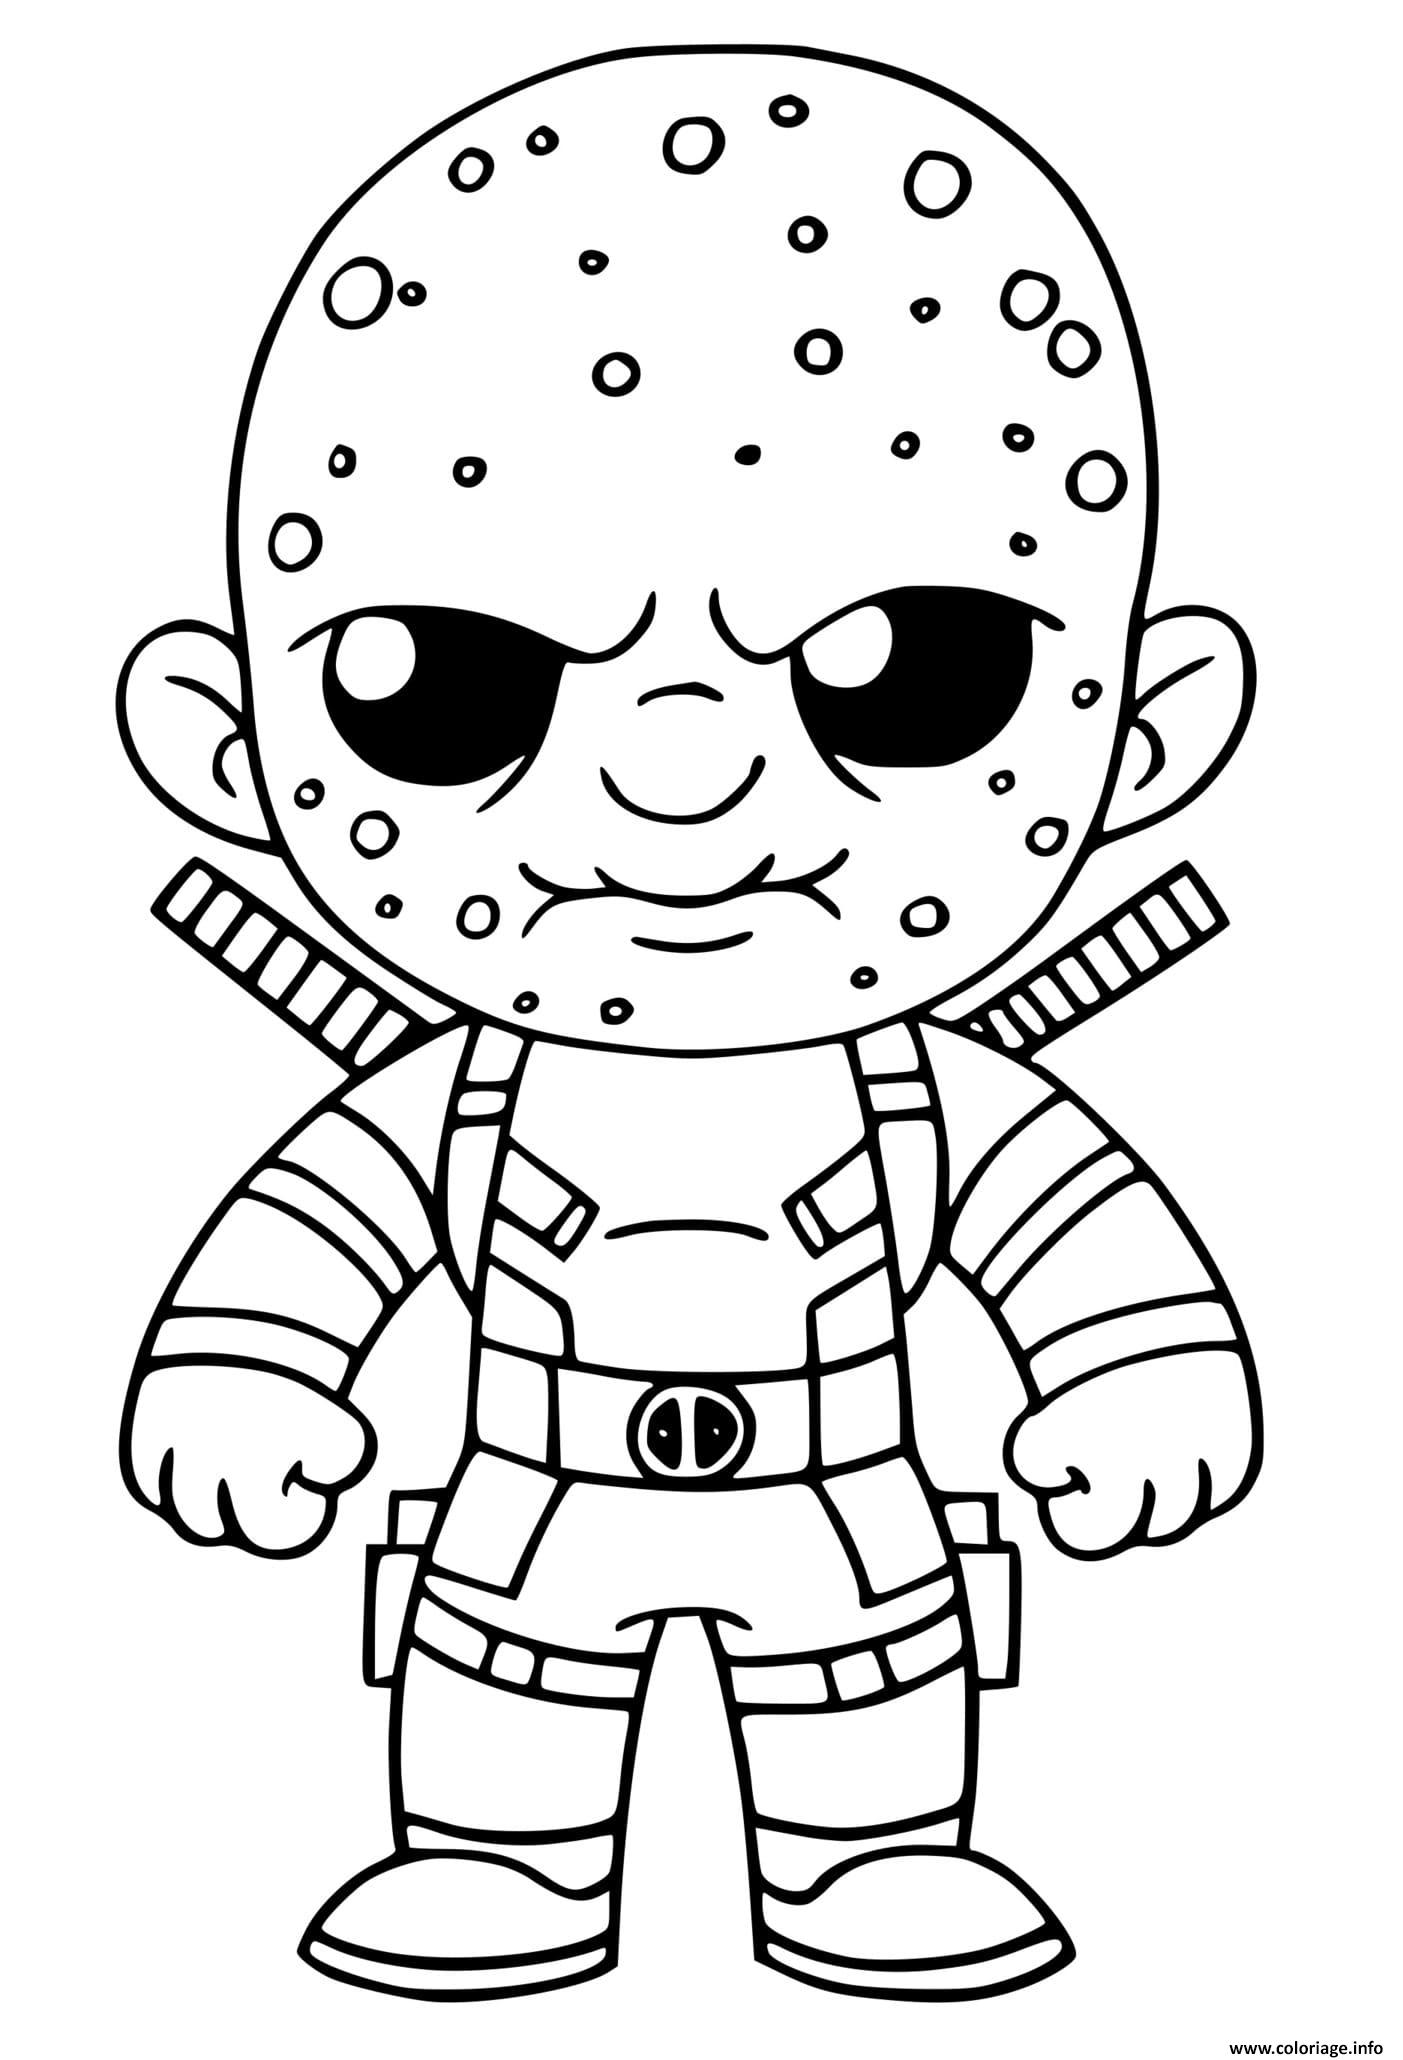 Coloriage Deadpool Unmasked Fortnite - JeColorie.com